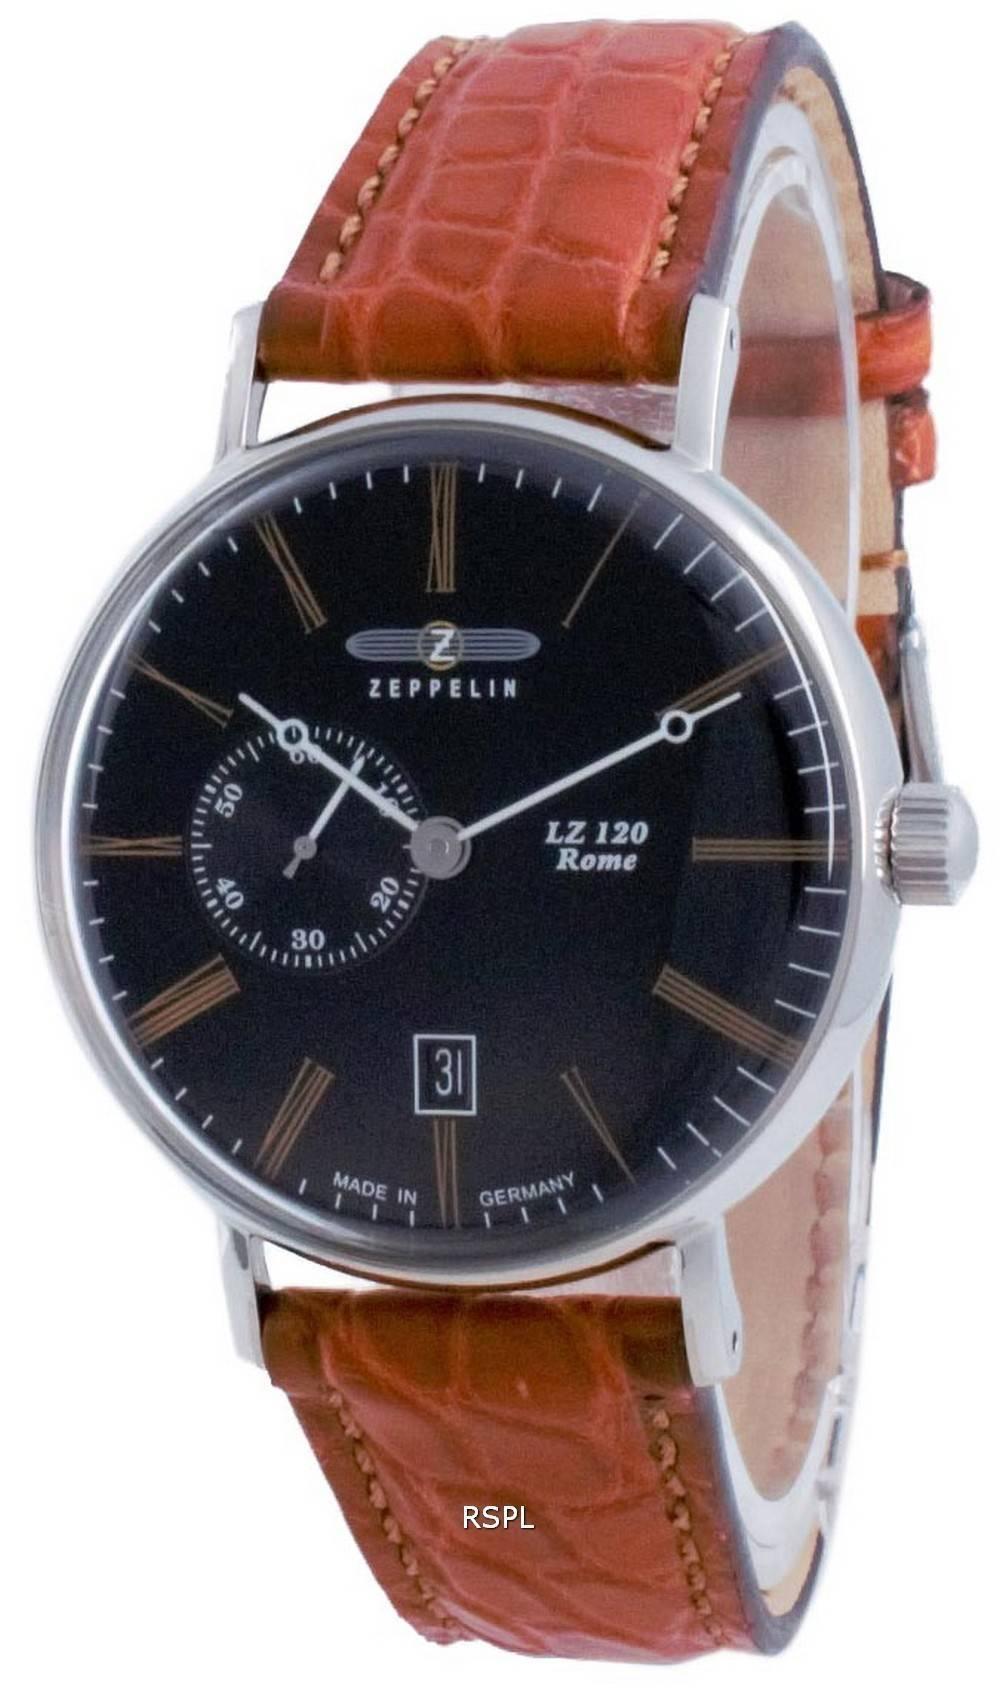 Zeppelin LZ120 Rome Black Dial Automatic 7104-2 71042 miesten kello